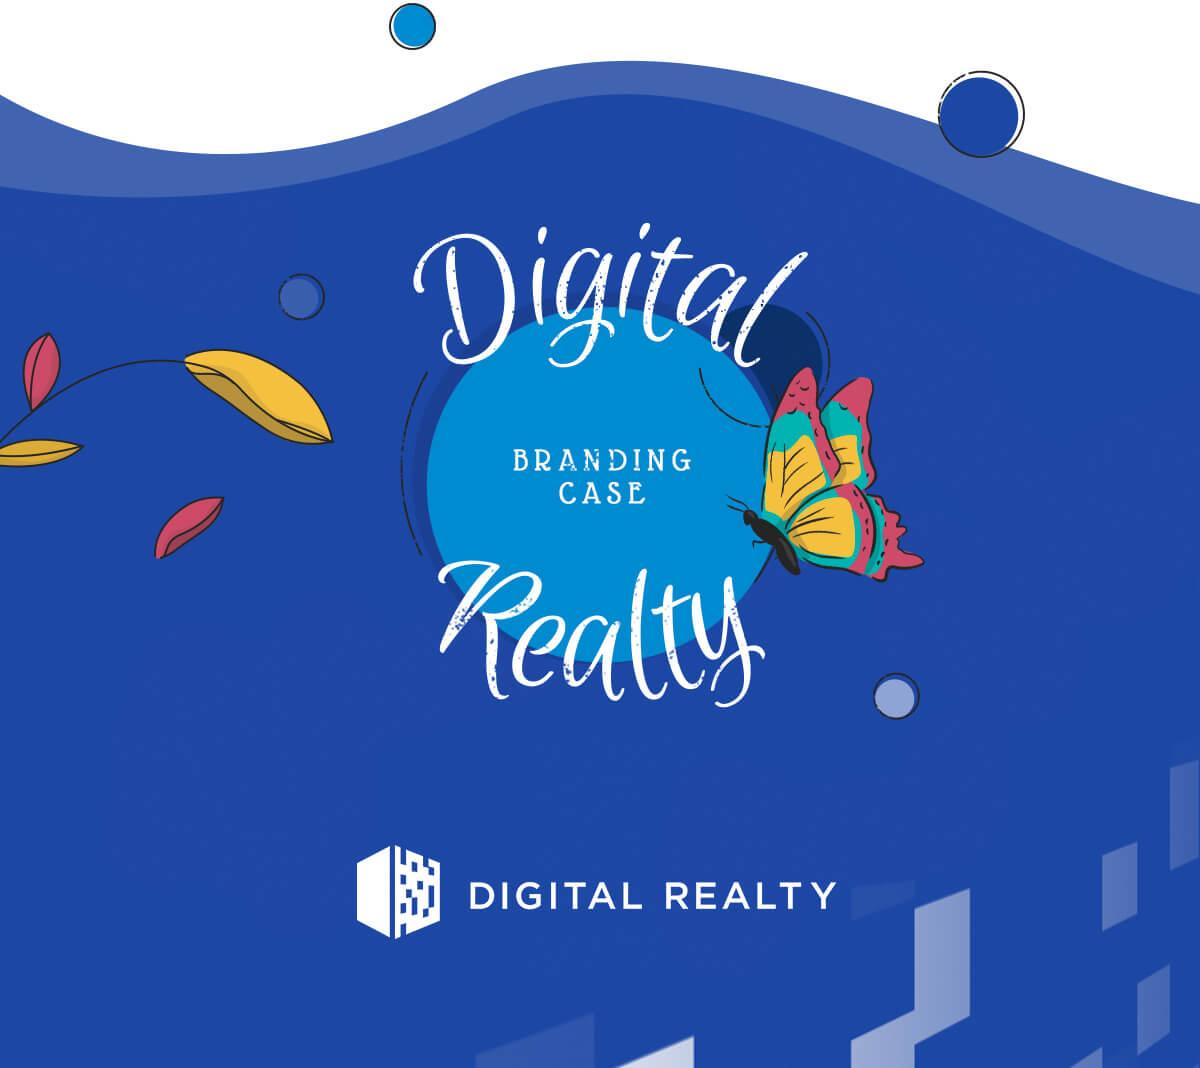 digitalrealty.com